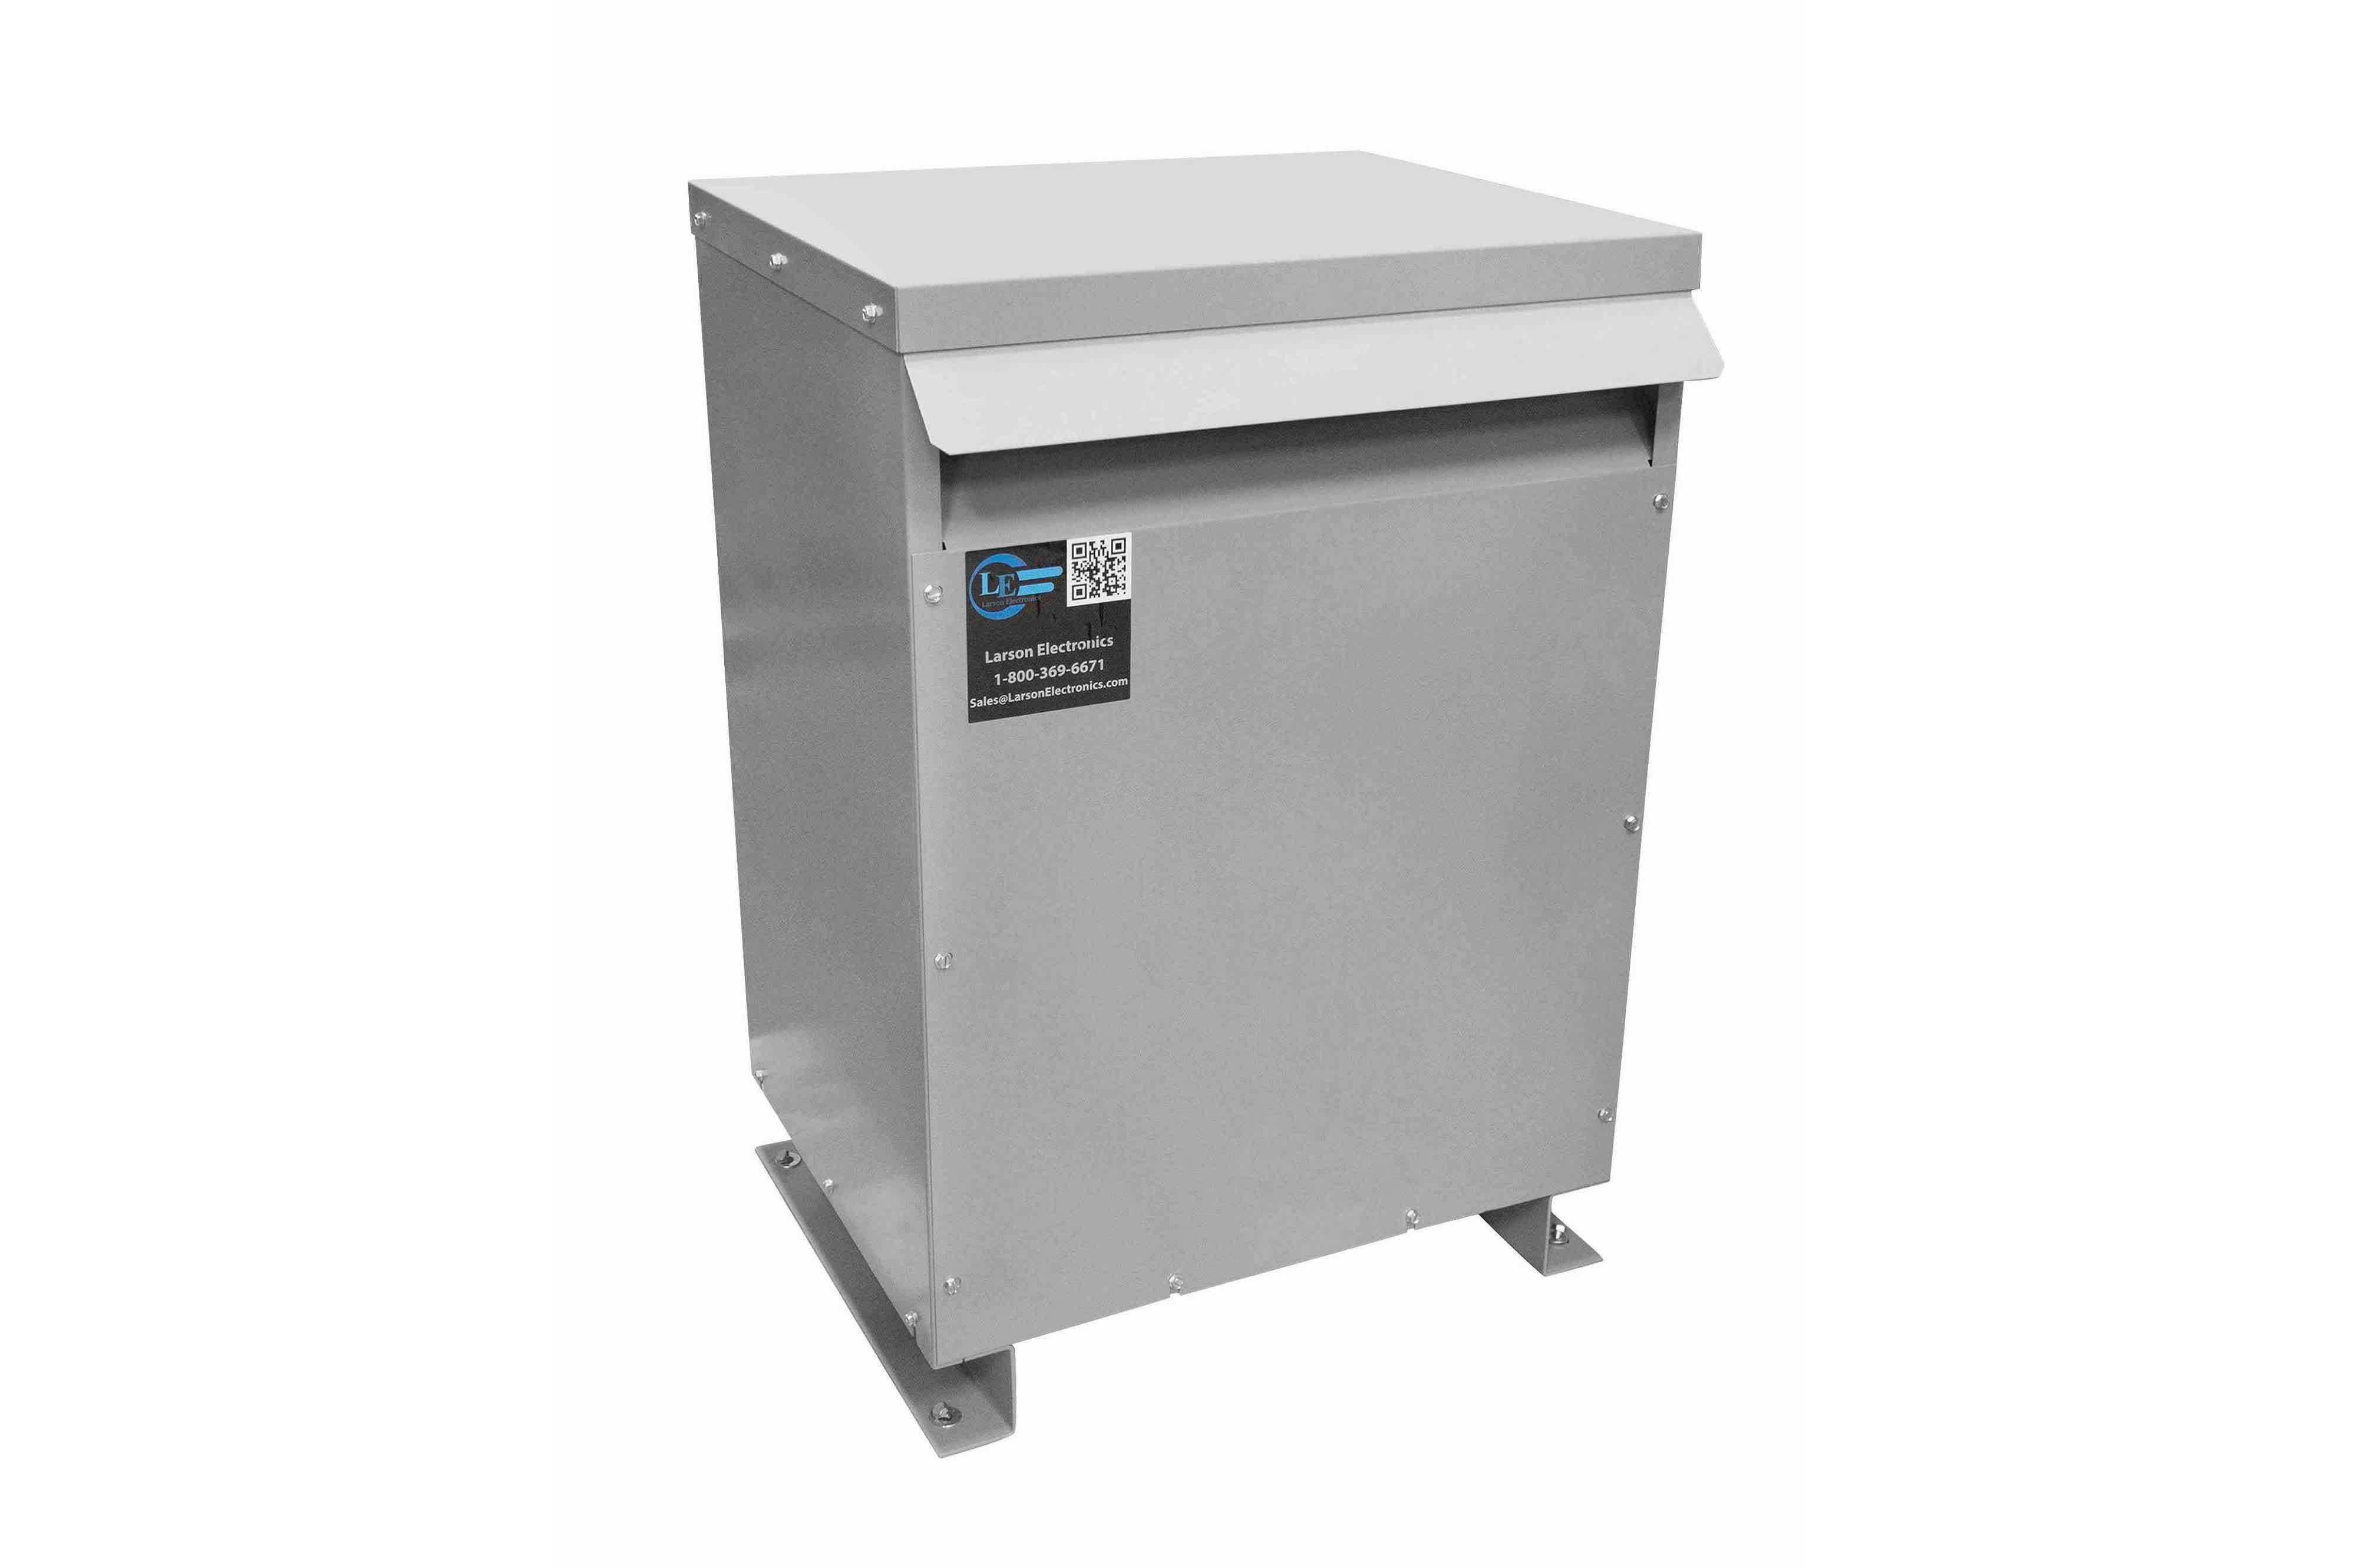 25 kVA 3PH DOE Transformer, 480V Delta Primary, 575Y/332 Wye-N Secondary, N3R, Ventilated, 60 Hz